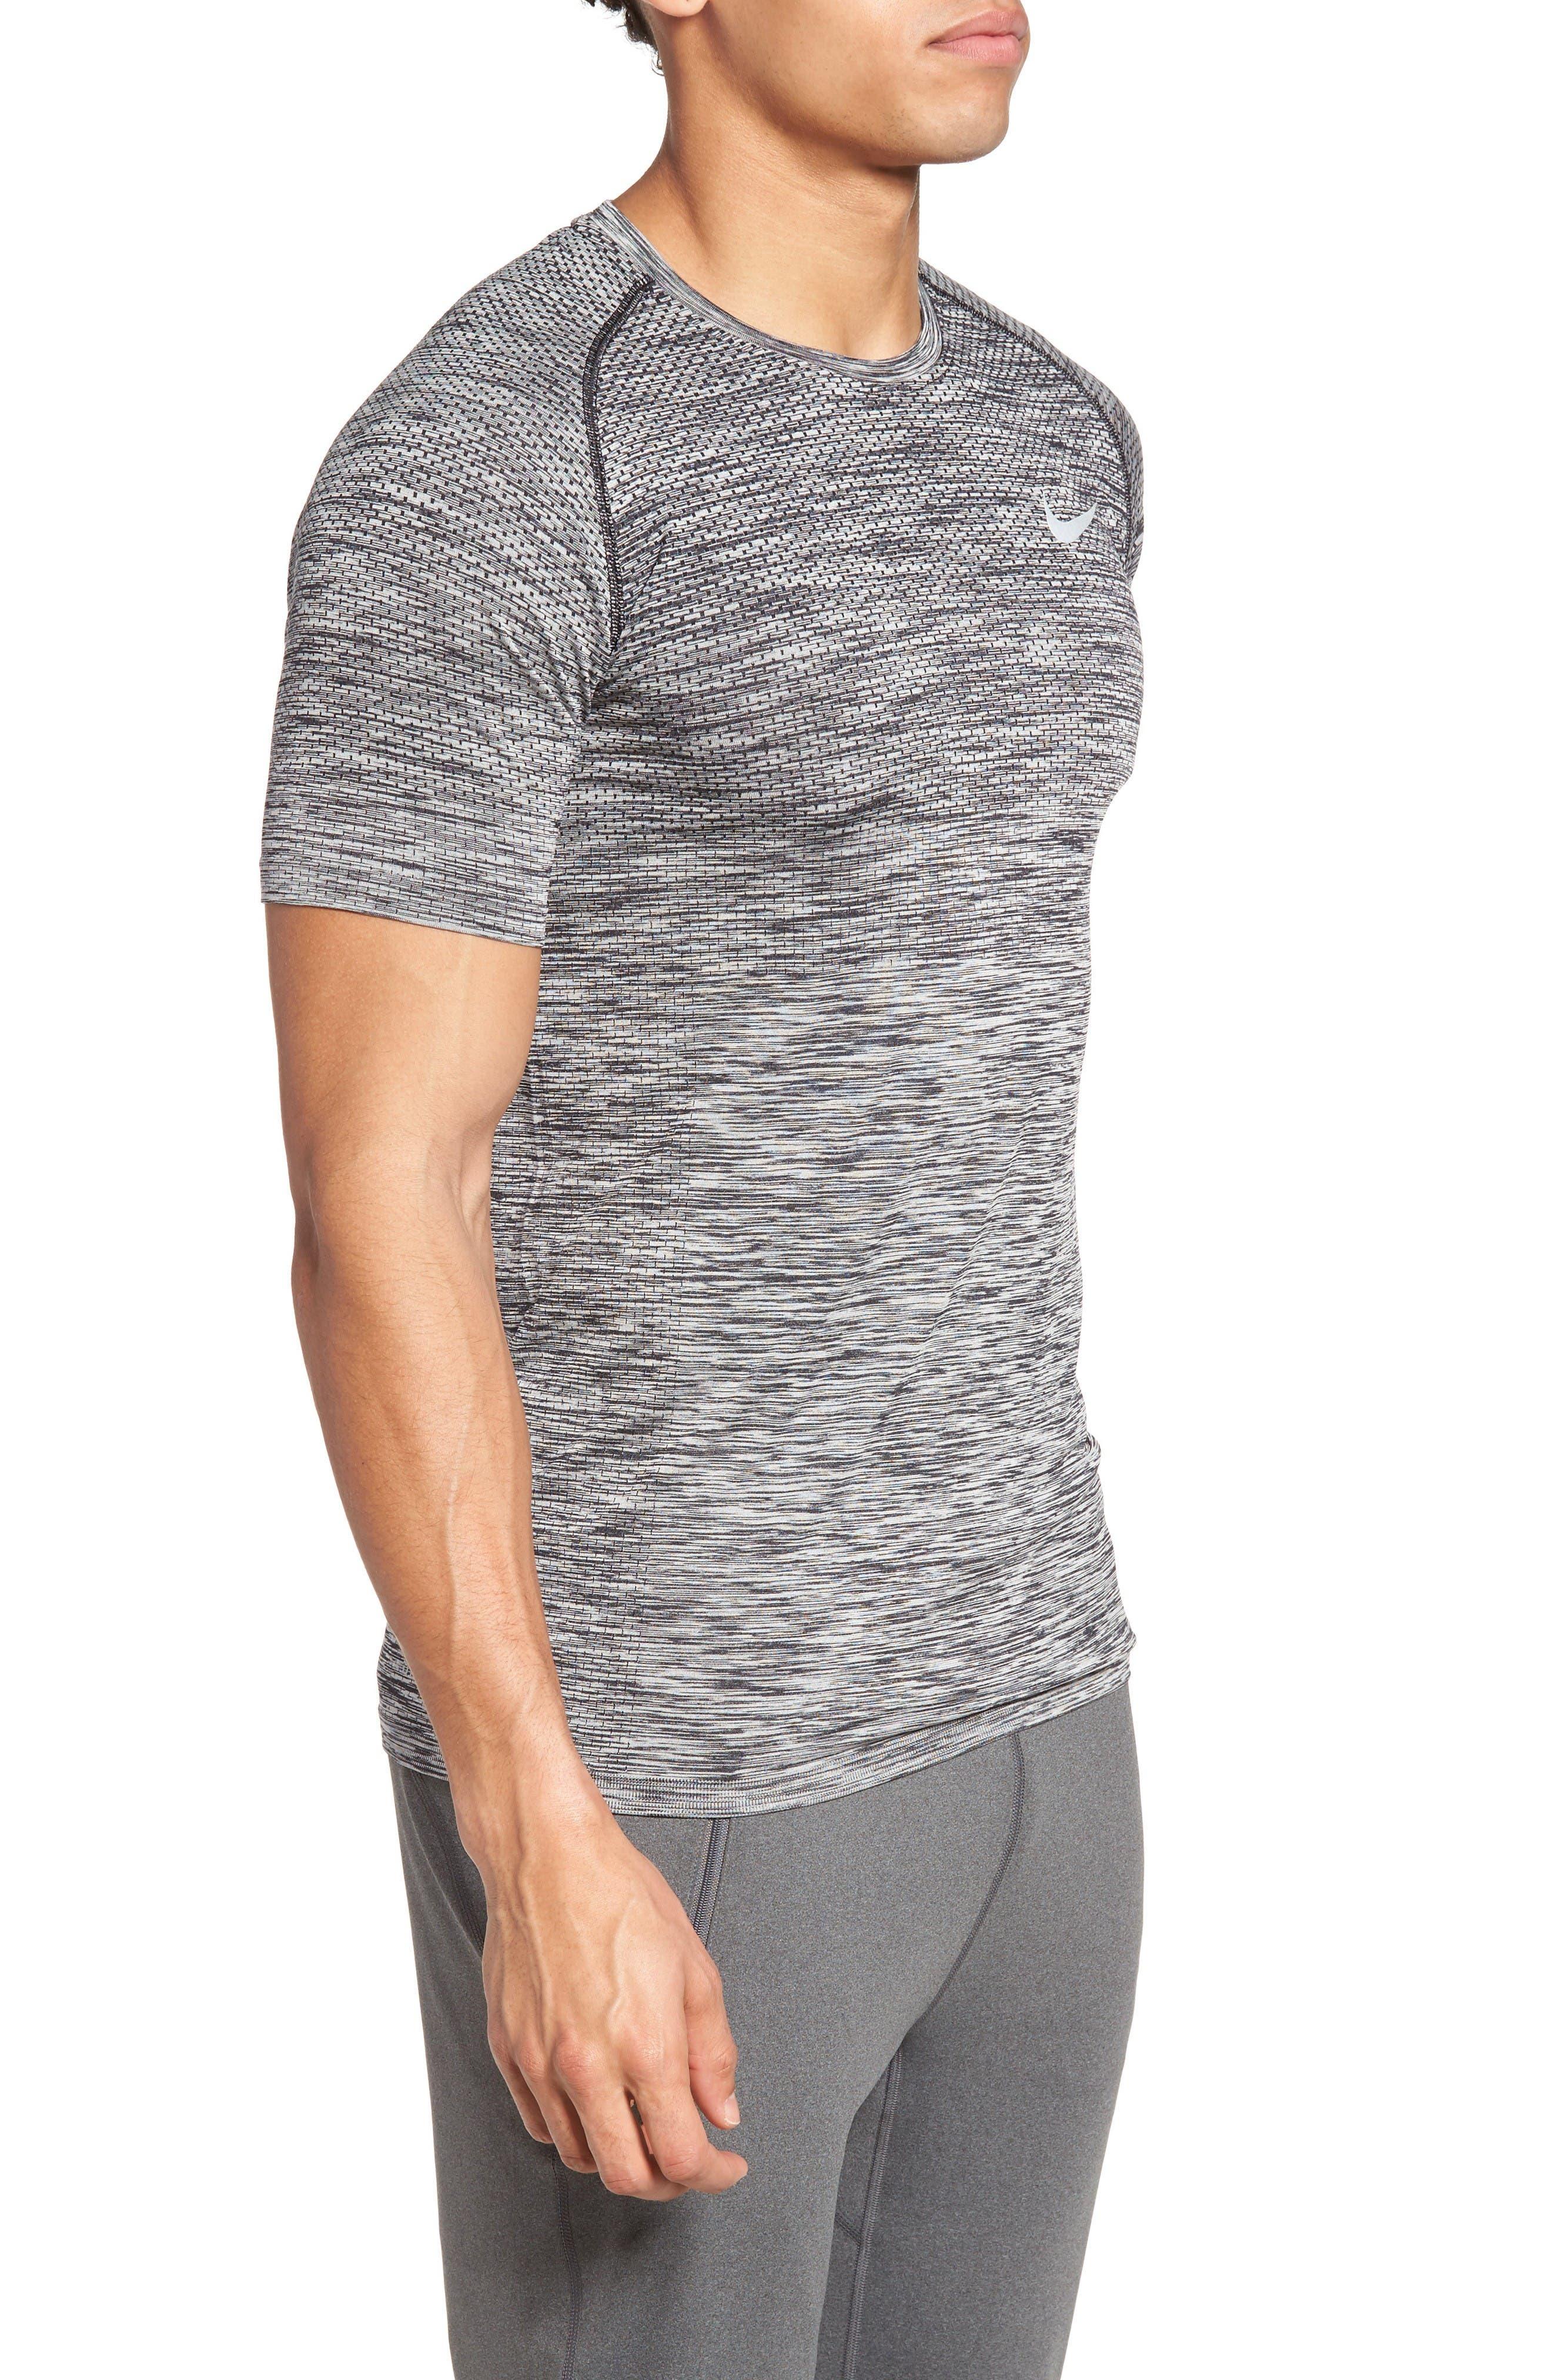 Men Dry Knit Running T-Shirt,                             Alternate thumbnail 3, color,                             Black/ Heather